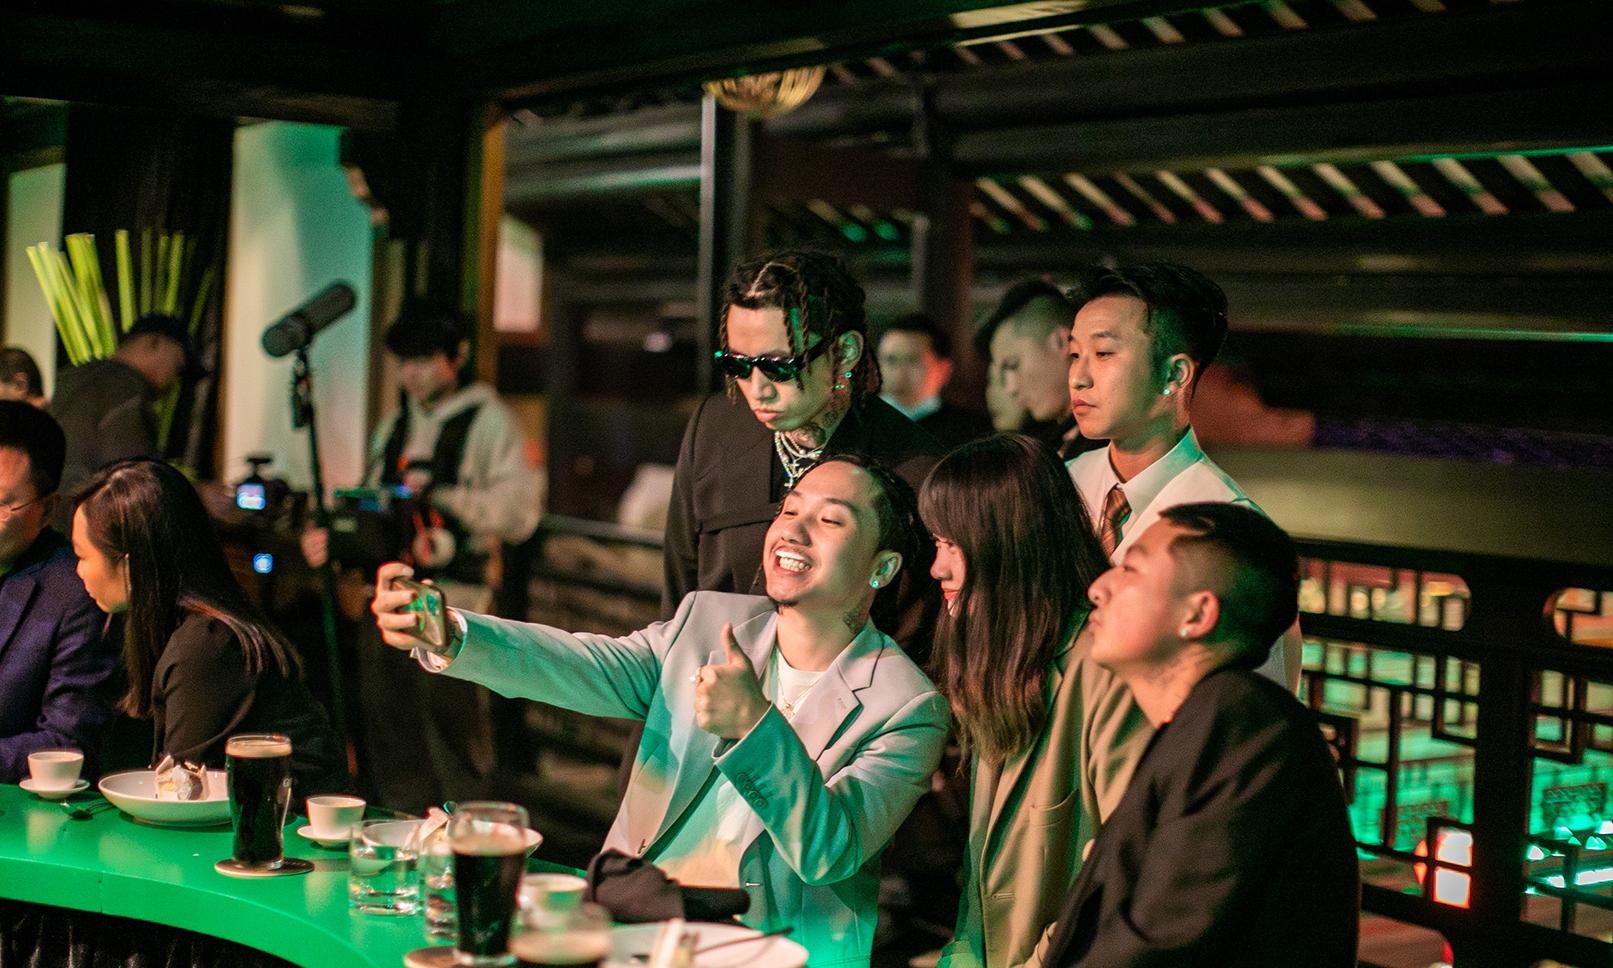 Guinness 啤酒携手名厨刘一帆举办圣帕特里克晚宴